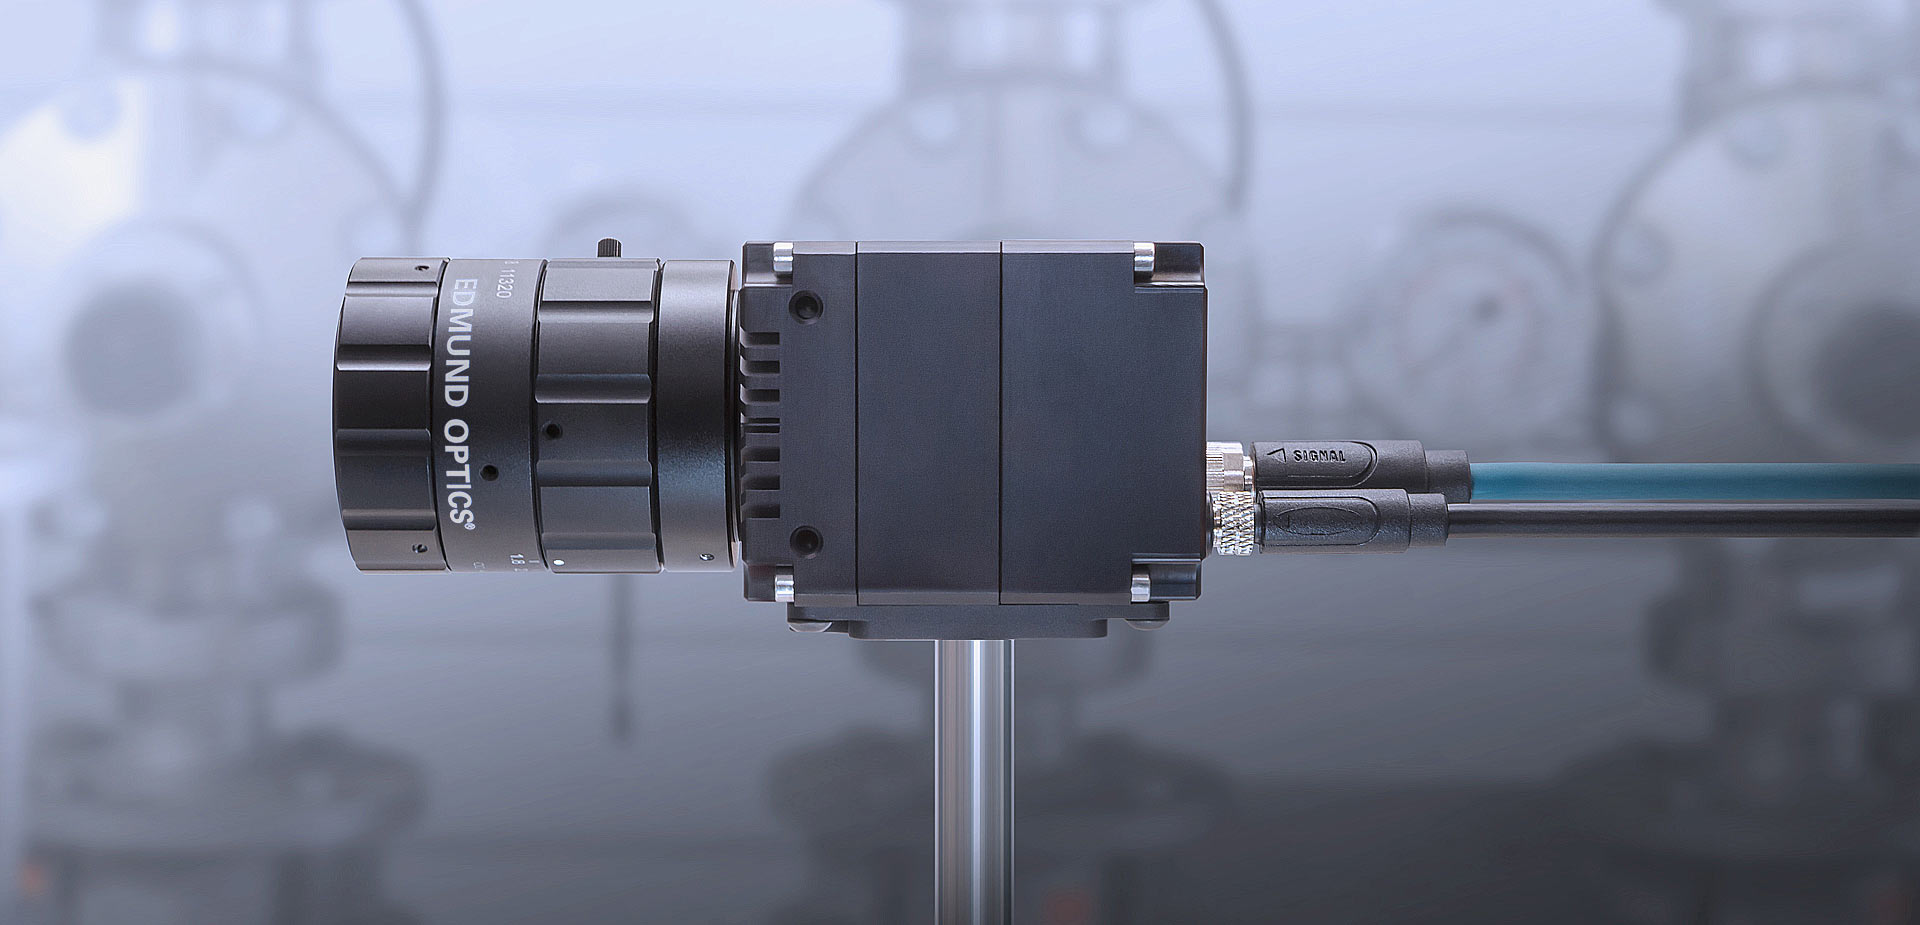 Atlas Industrial Machine Vision Camera with Edmund Optics Lens